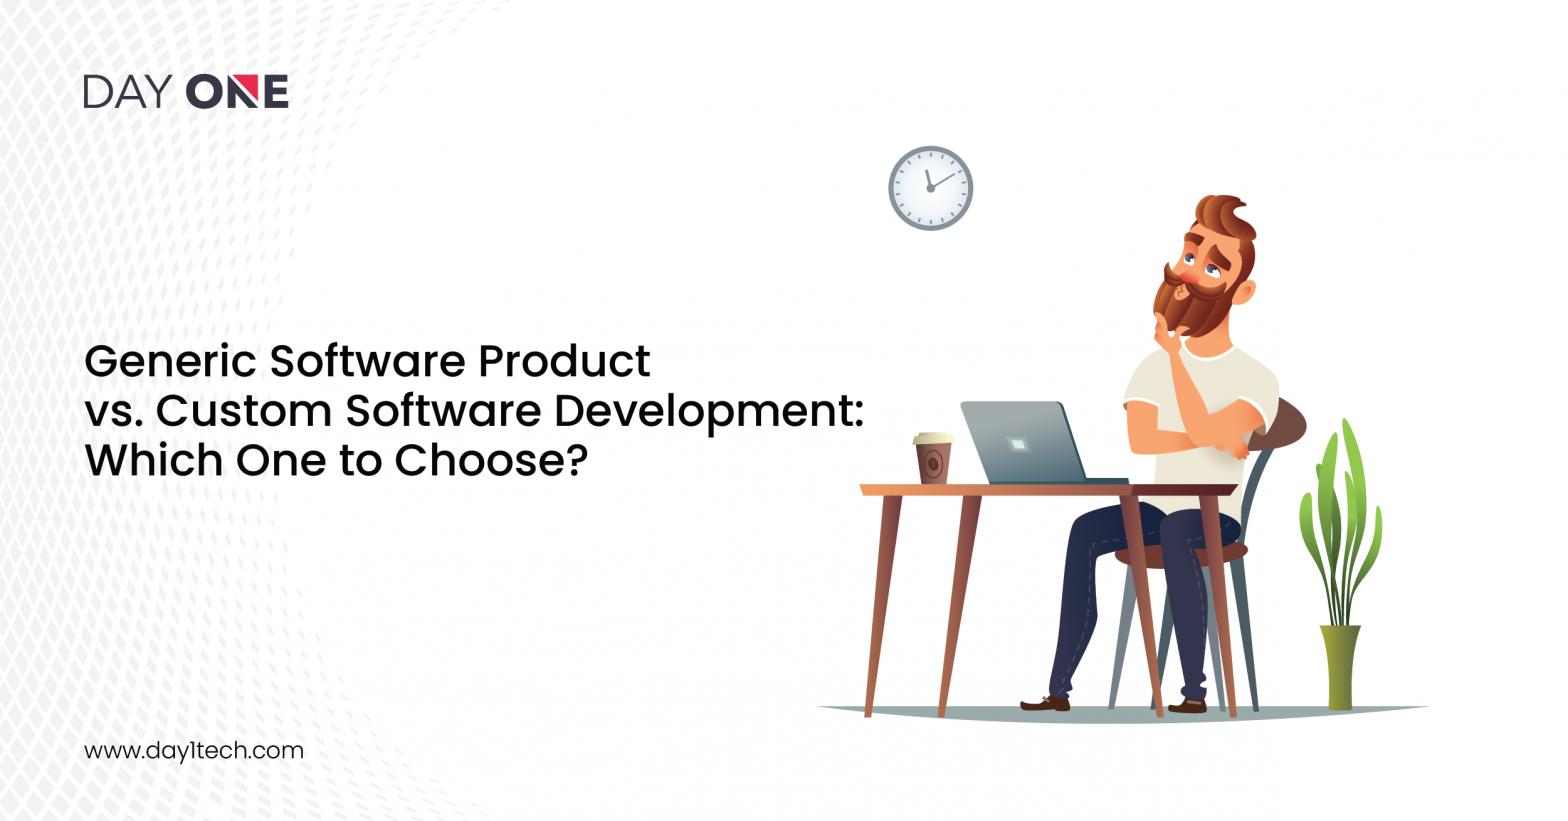 Generic Software Vs Custom Software